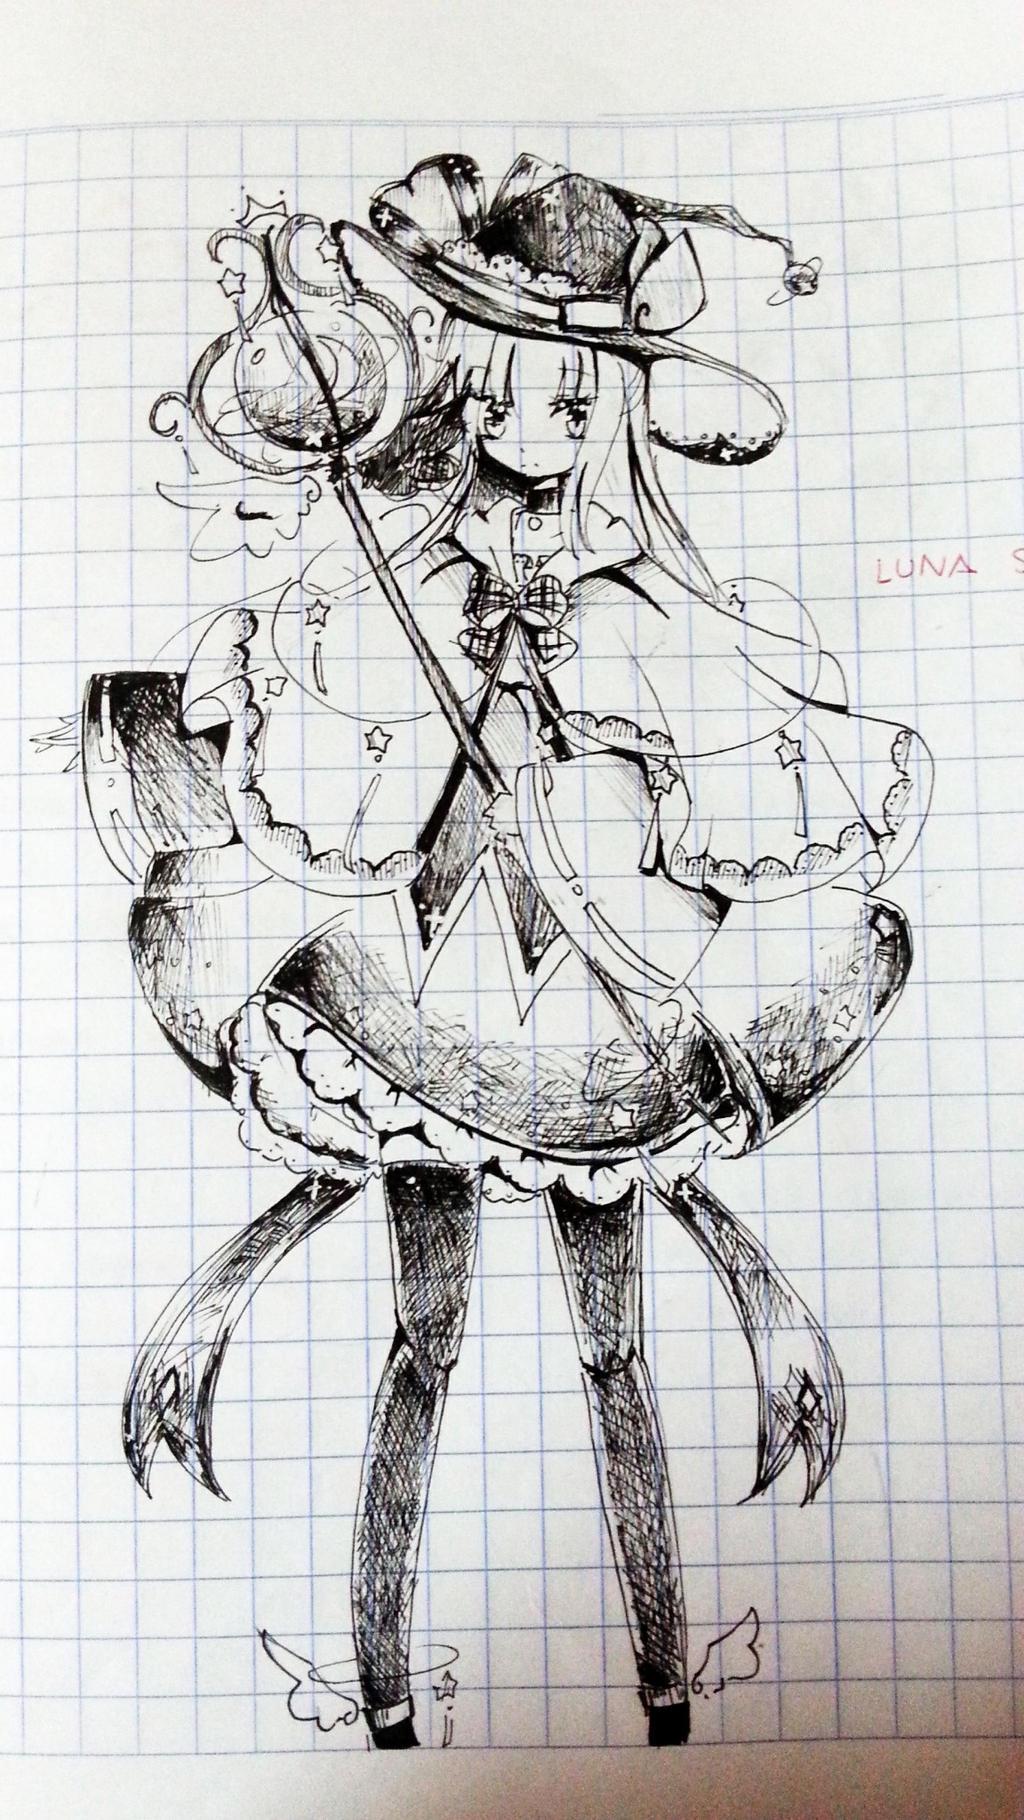 luna strudel doodle by HakuYukihana